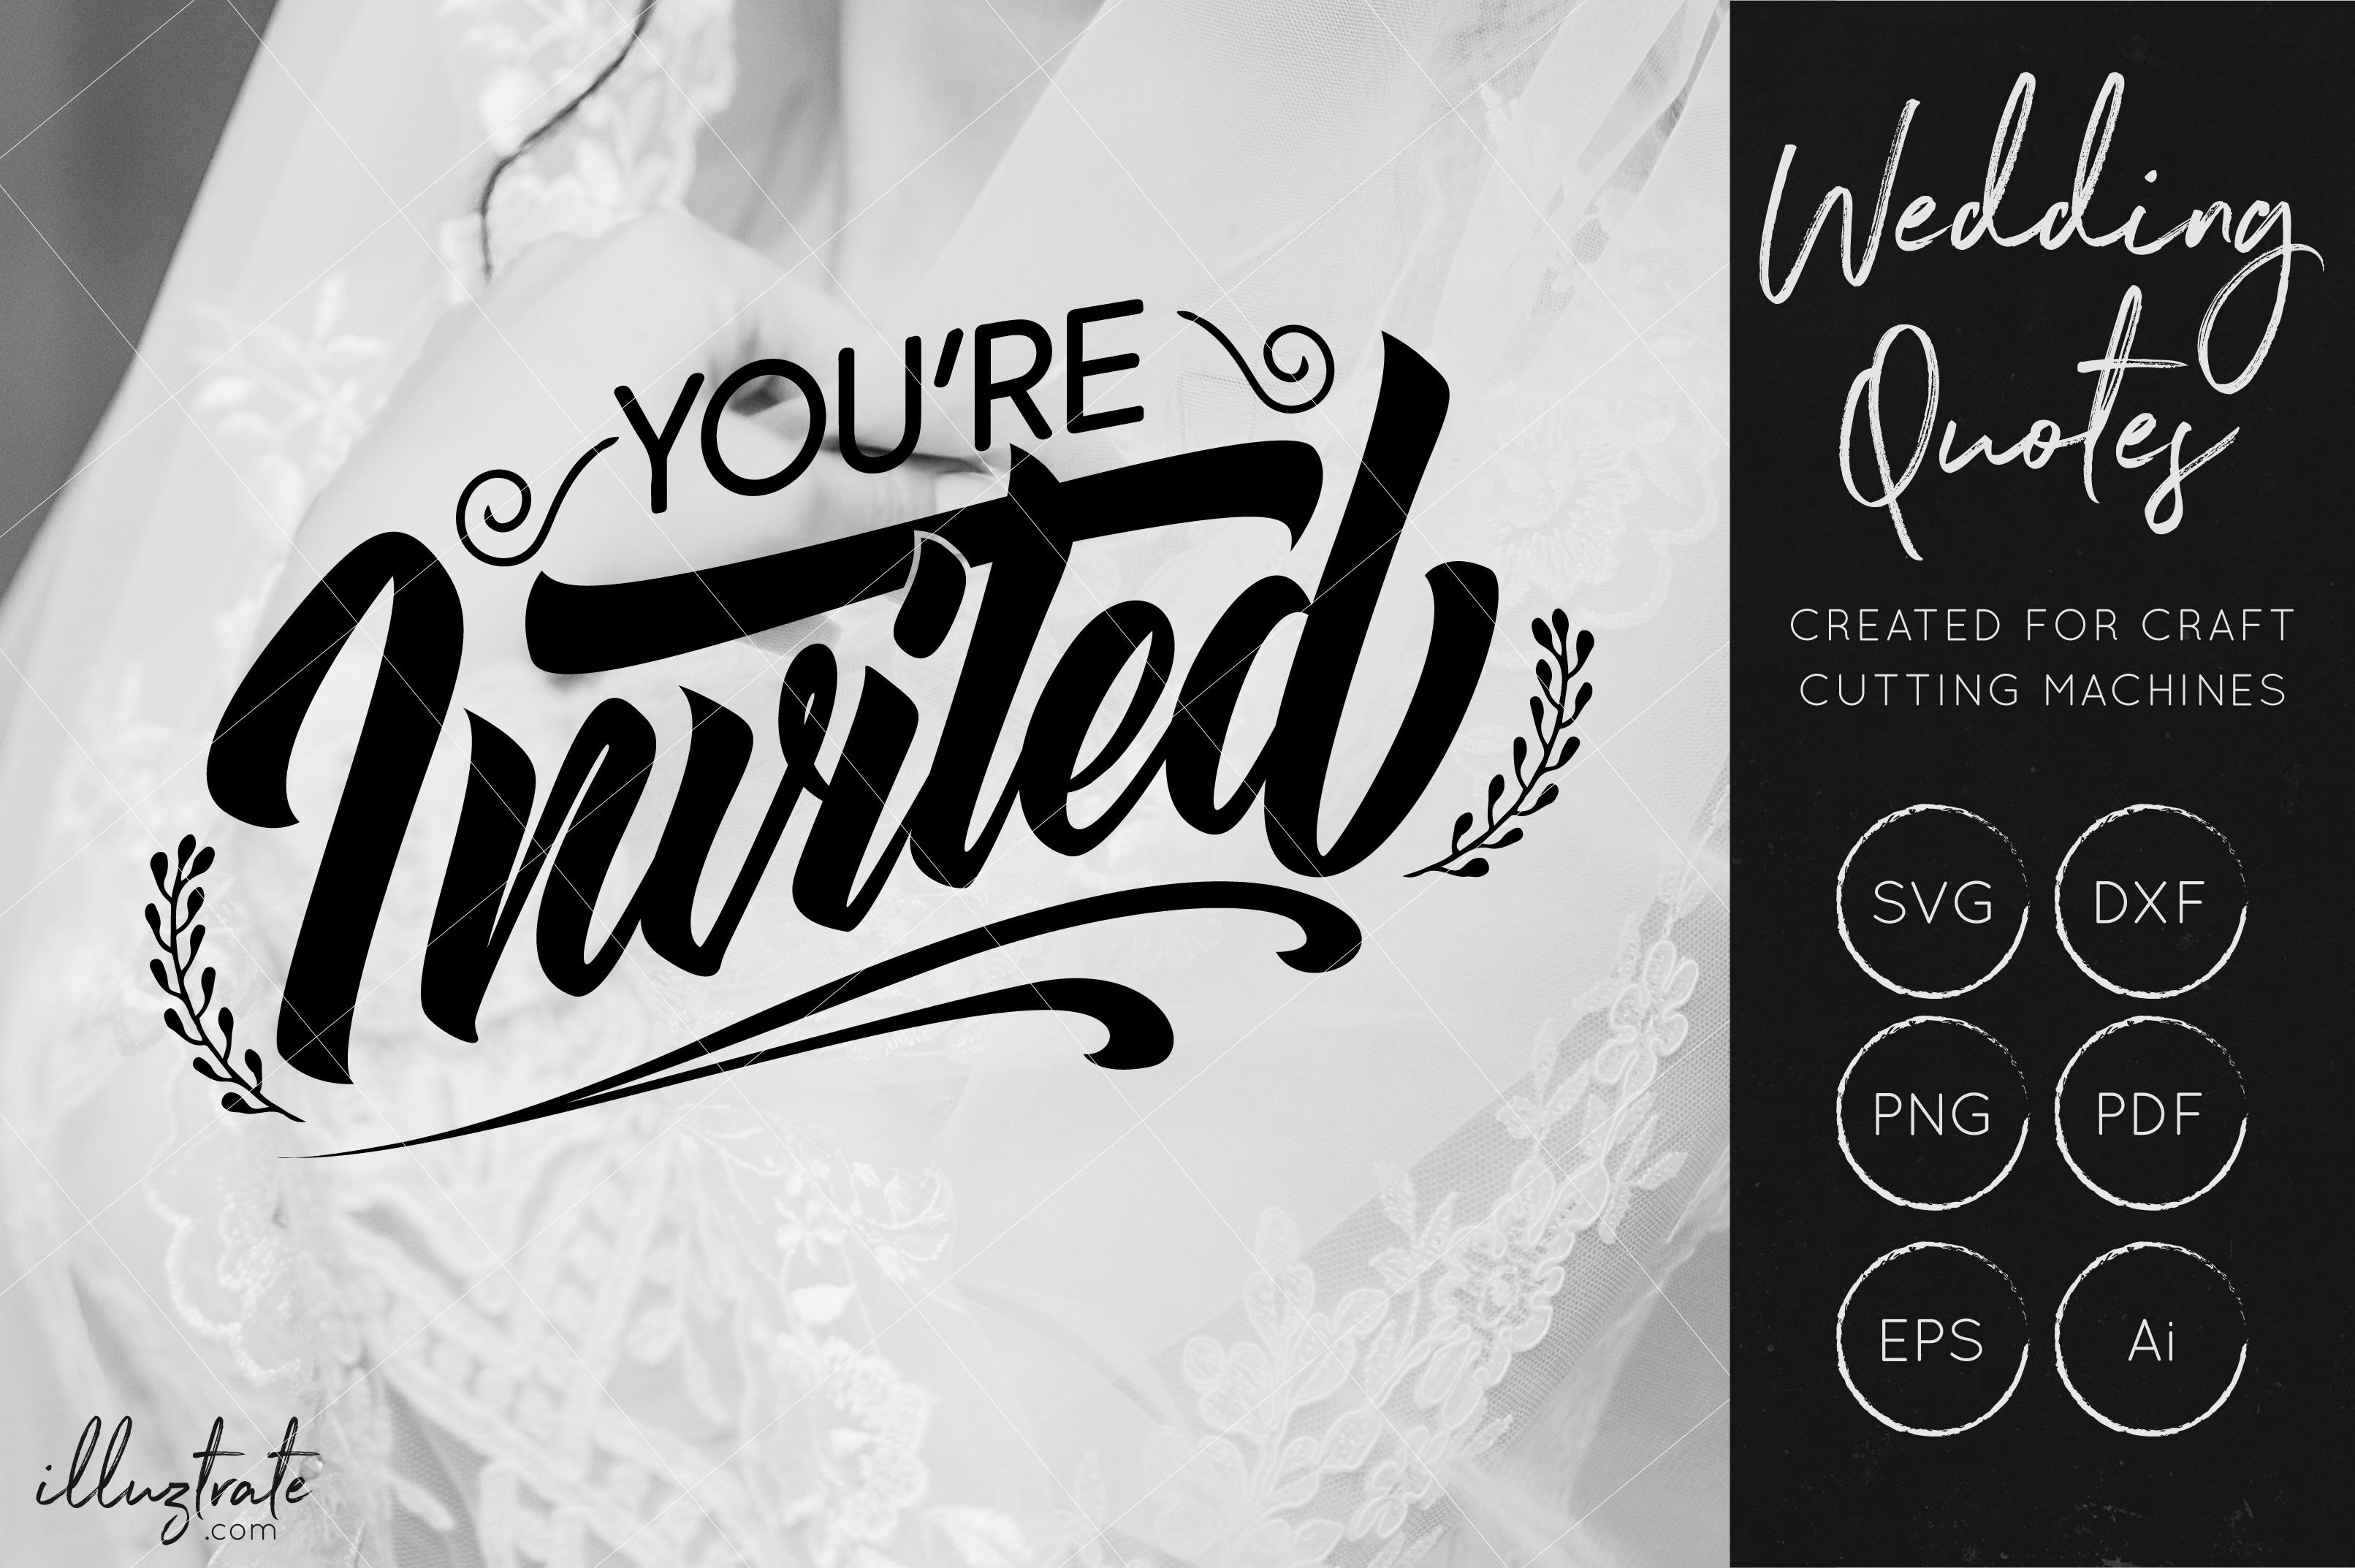 Wedding SVG Cut Files Bundle - Wedding Quotes - Wedding SVG example image 3